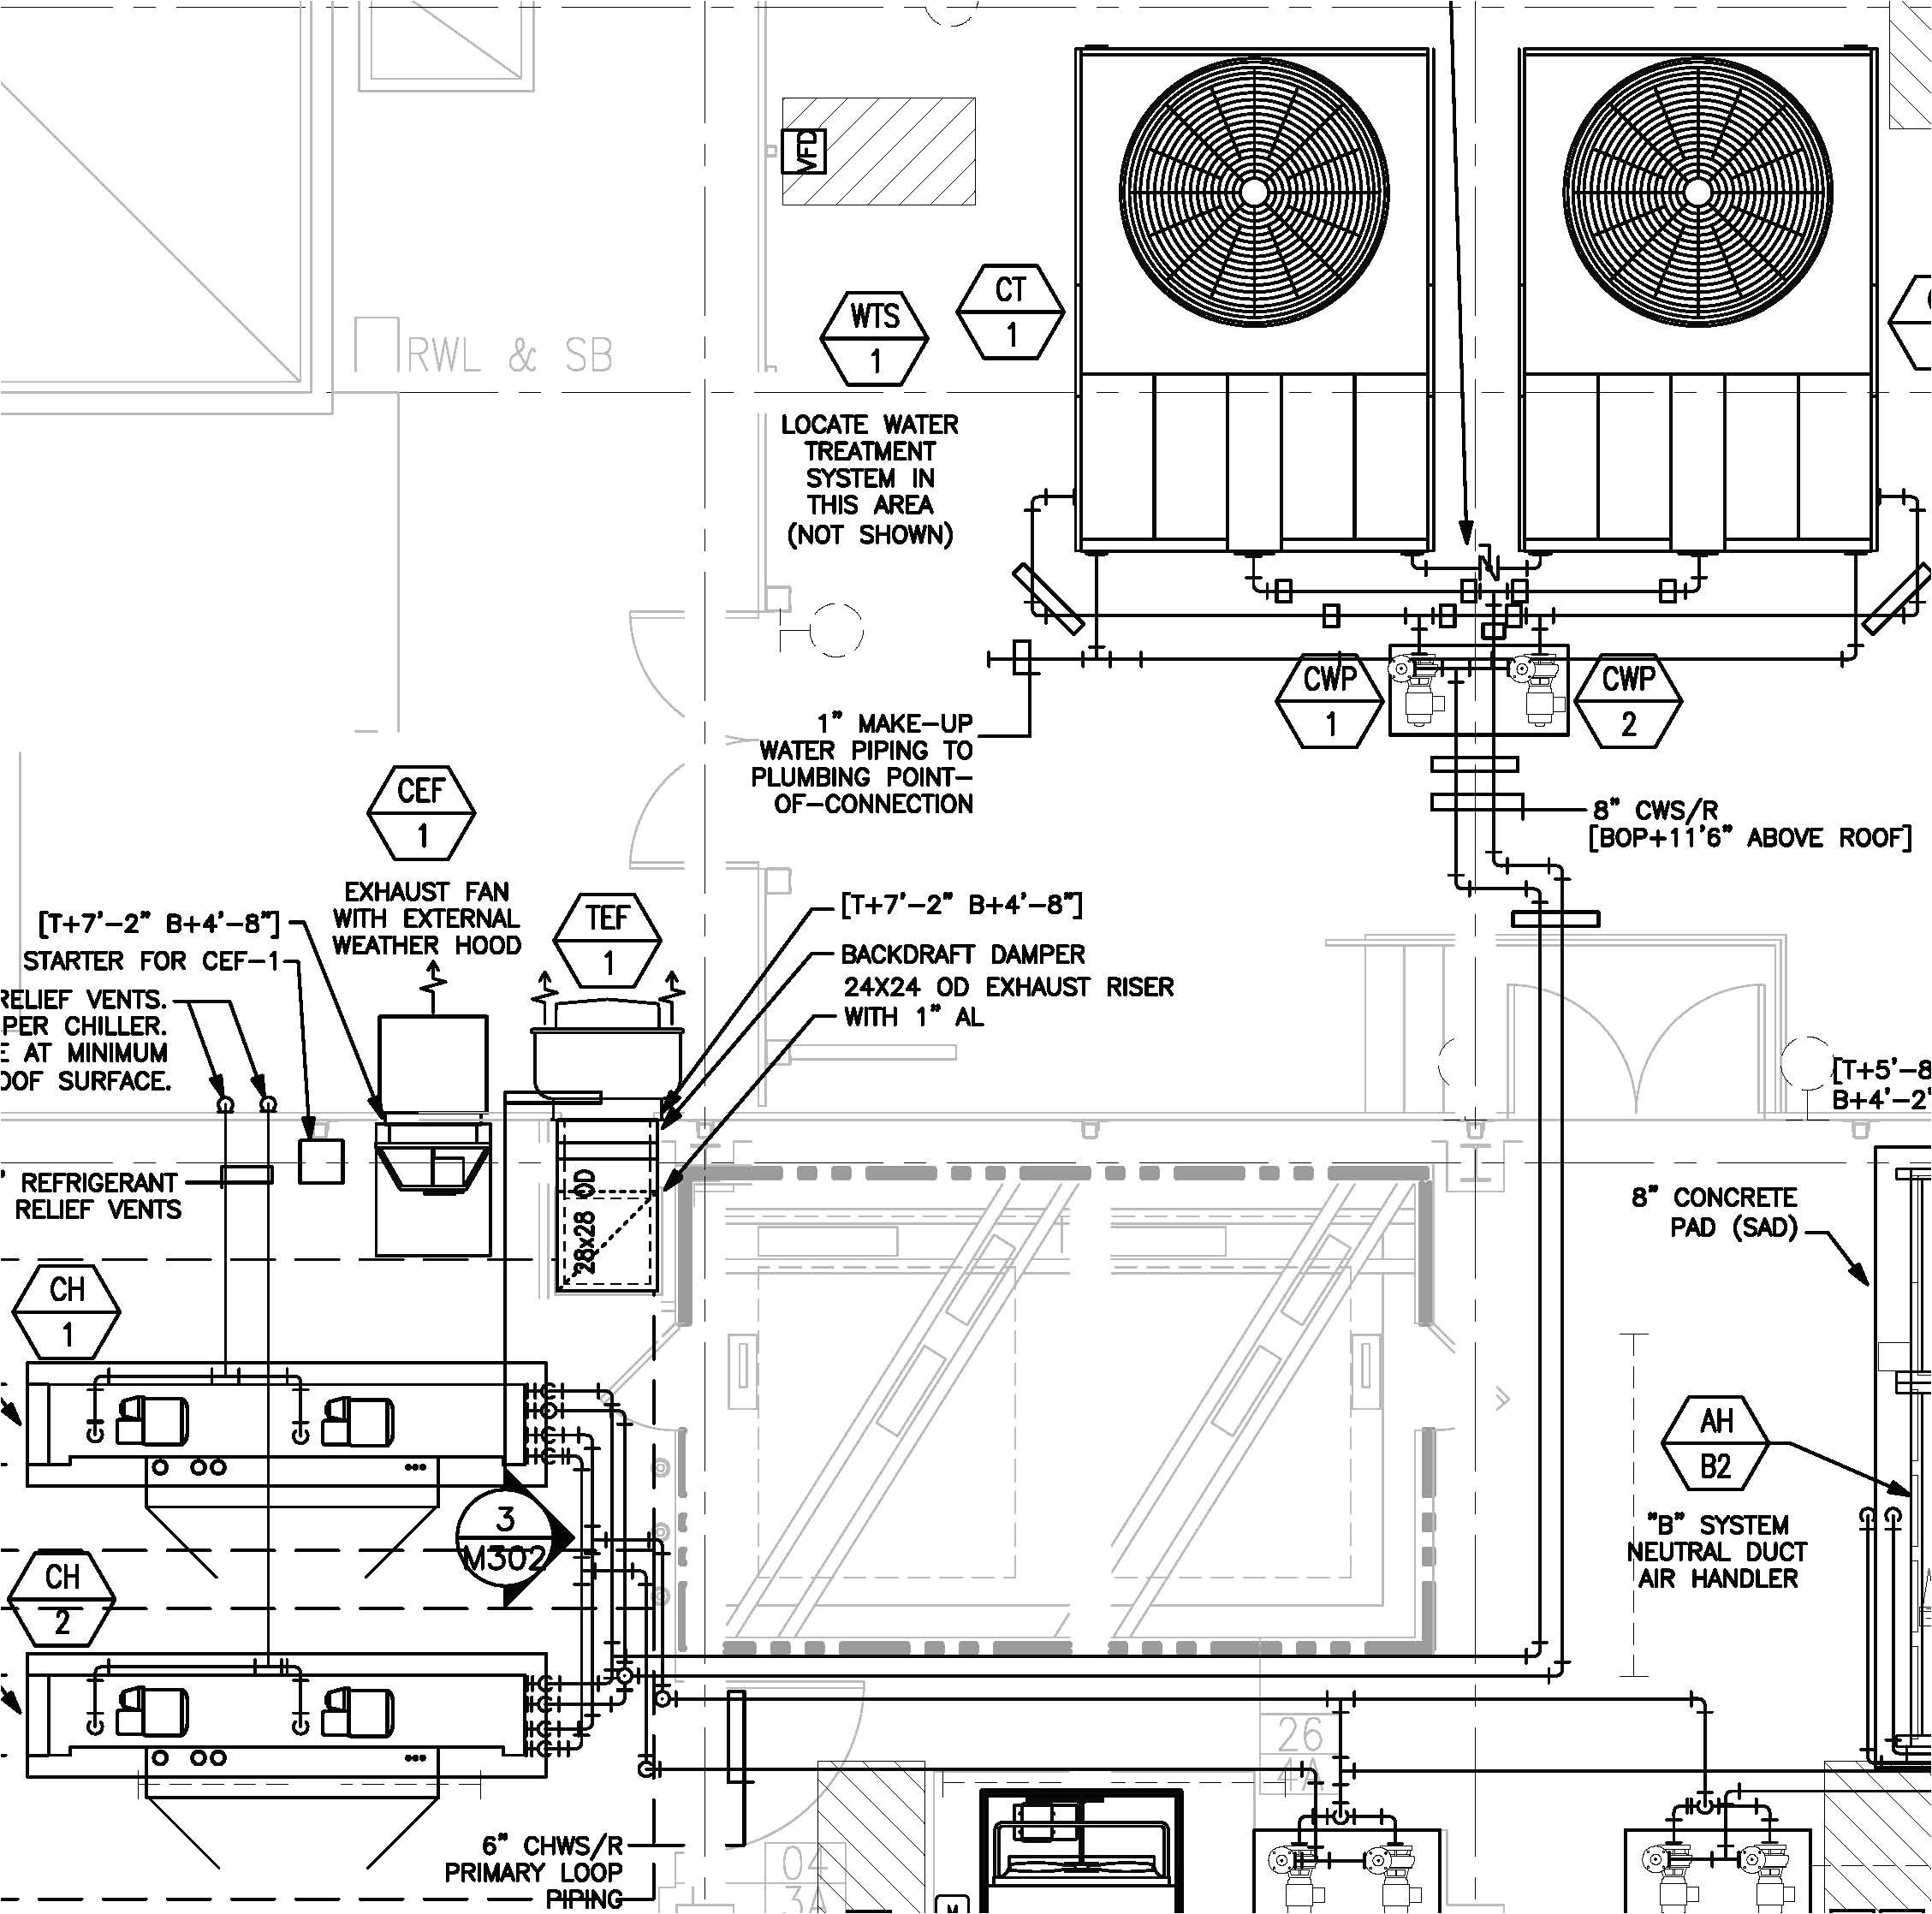 lef 5 wiring diagram u2013 electrical wiring diagram buildinglef 5 wiring diagram elegant aiphone lef